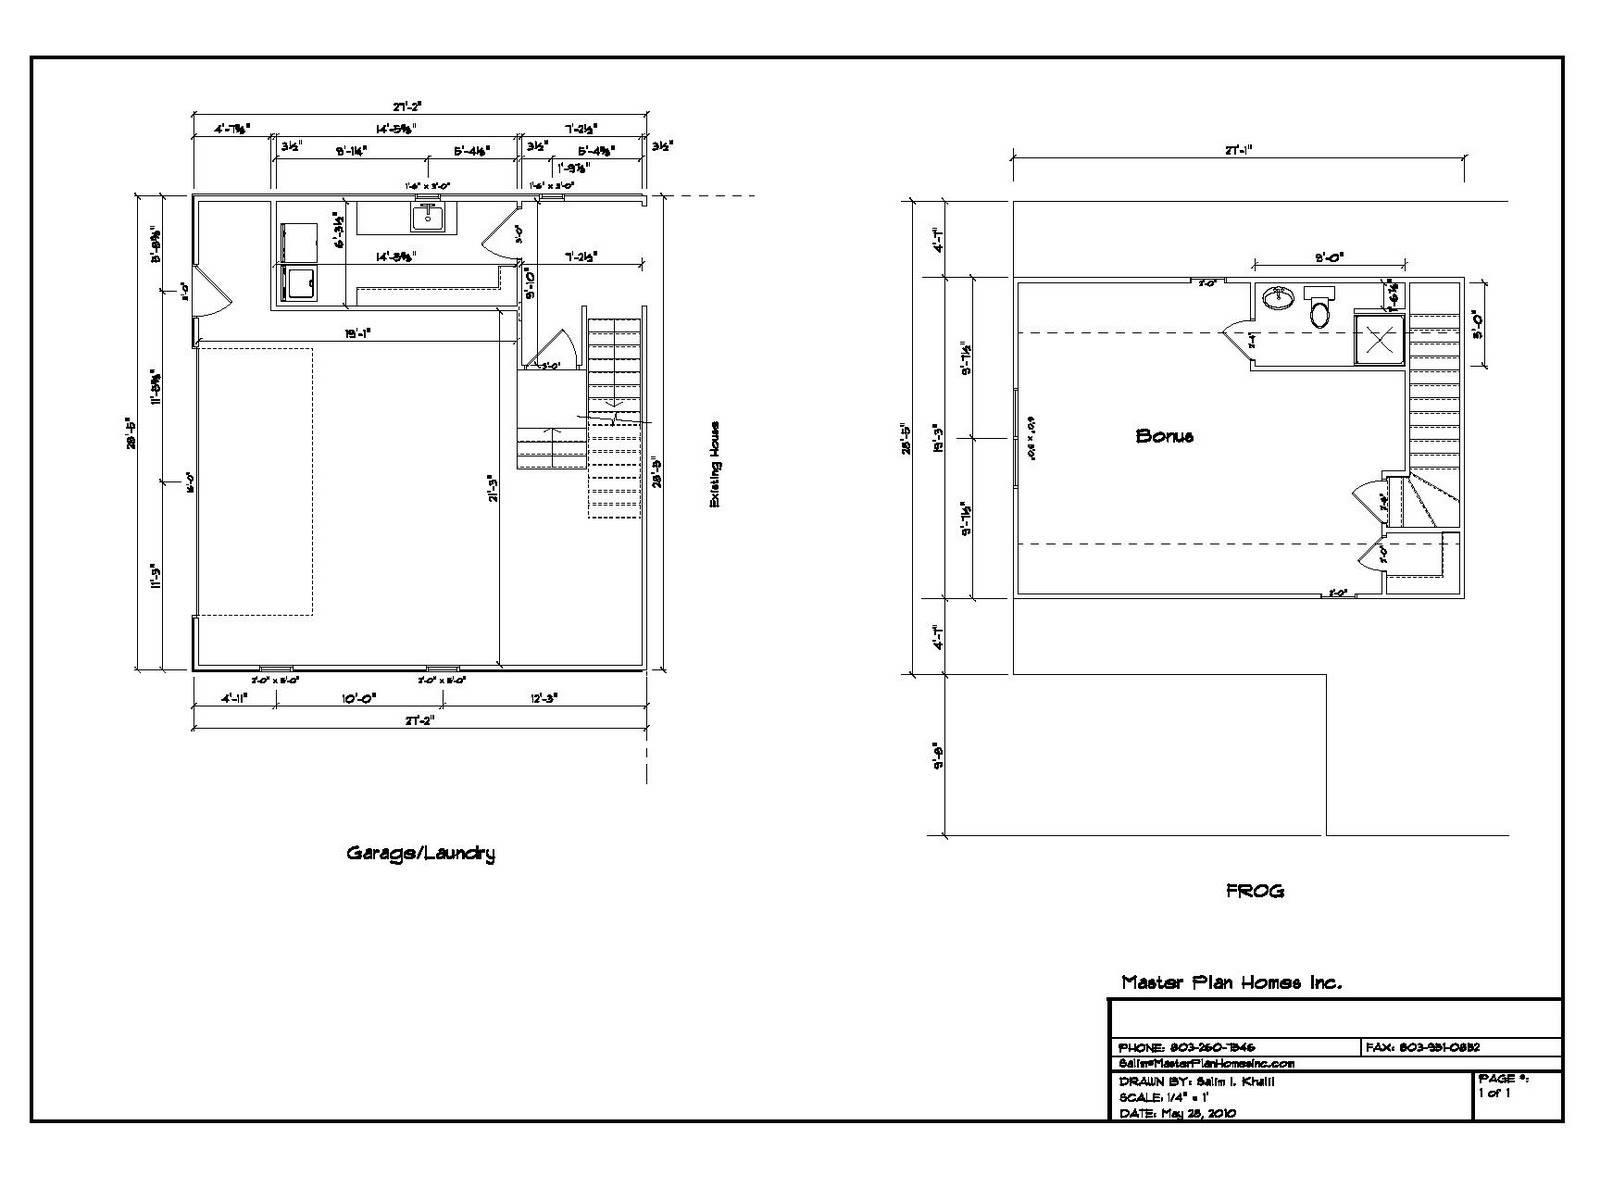 Garage Plans With Bathroom Tiny House House Plans Modern